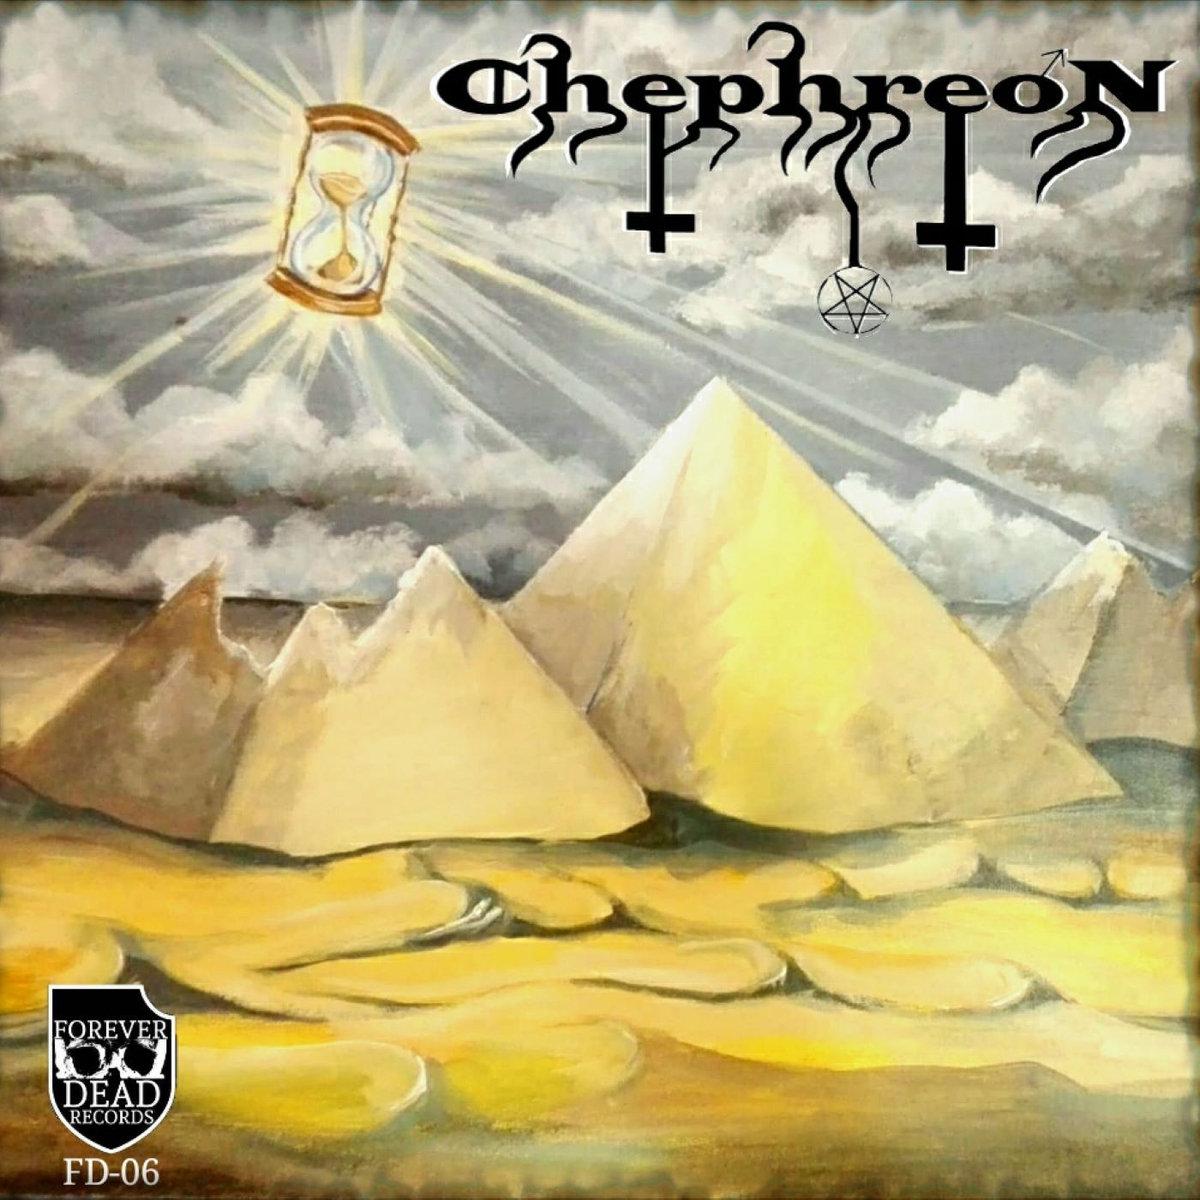 Chephreon - Corpse-painted thrash